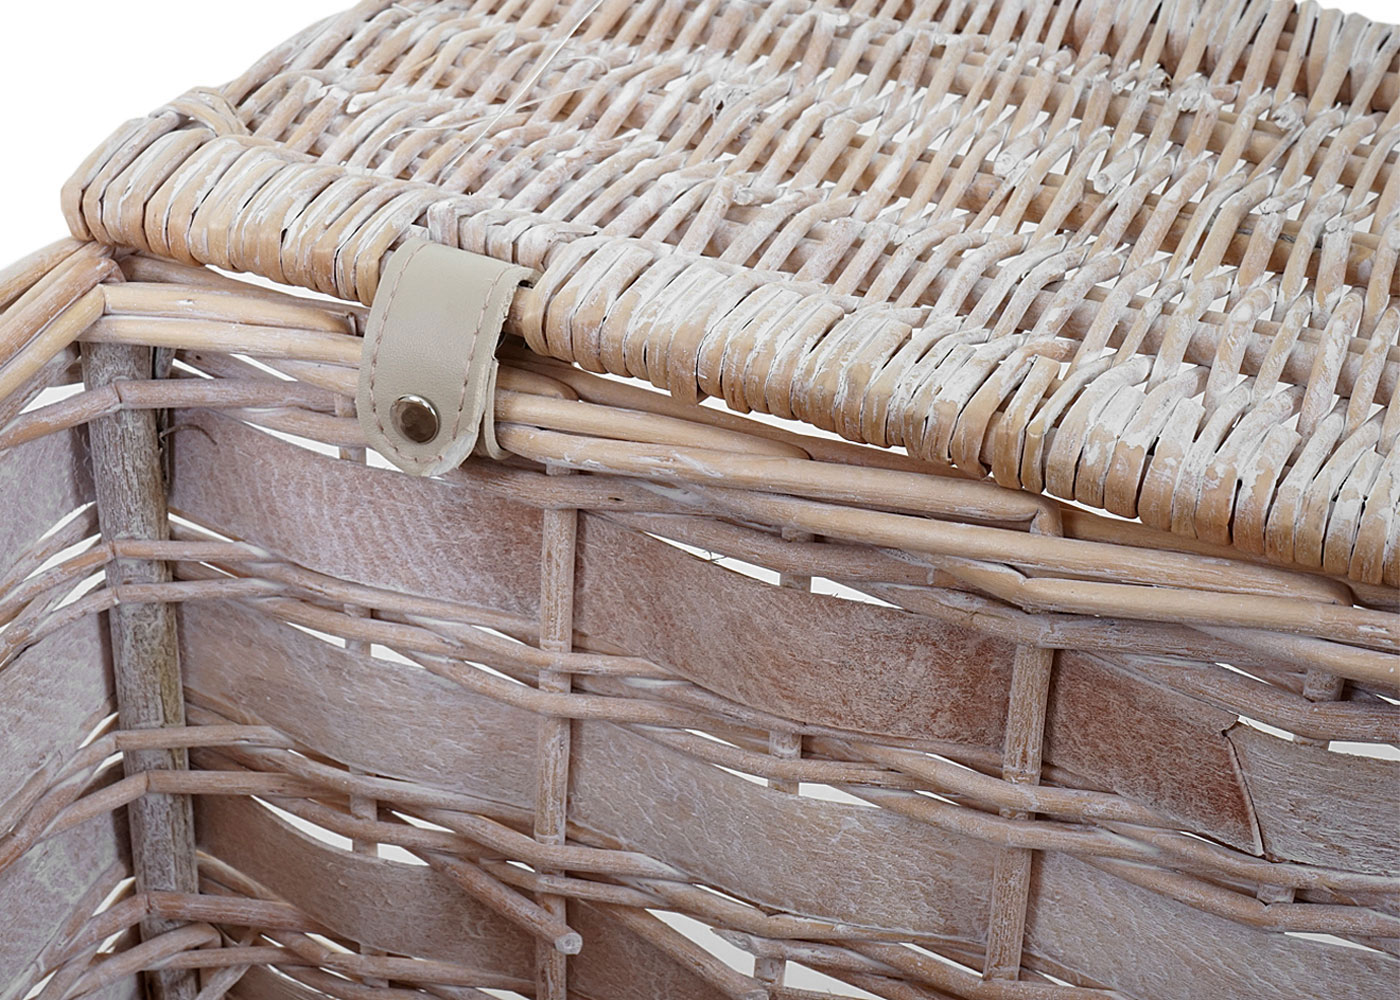 picknickkorb set f r 4 personen picknicktasche porzellan glas edelstahl holz kaufen bei. Black Bedroom Furniture Sets. Home Design Ideas